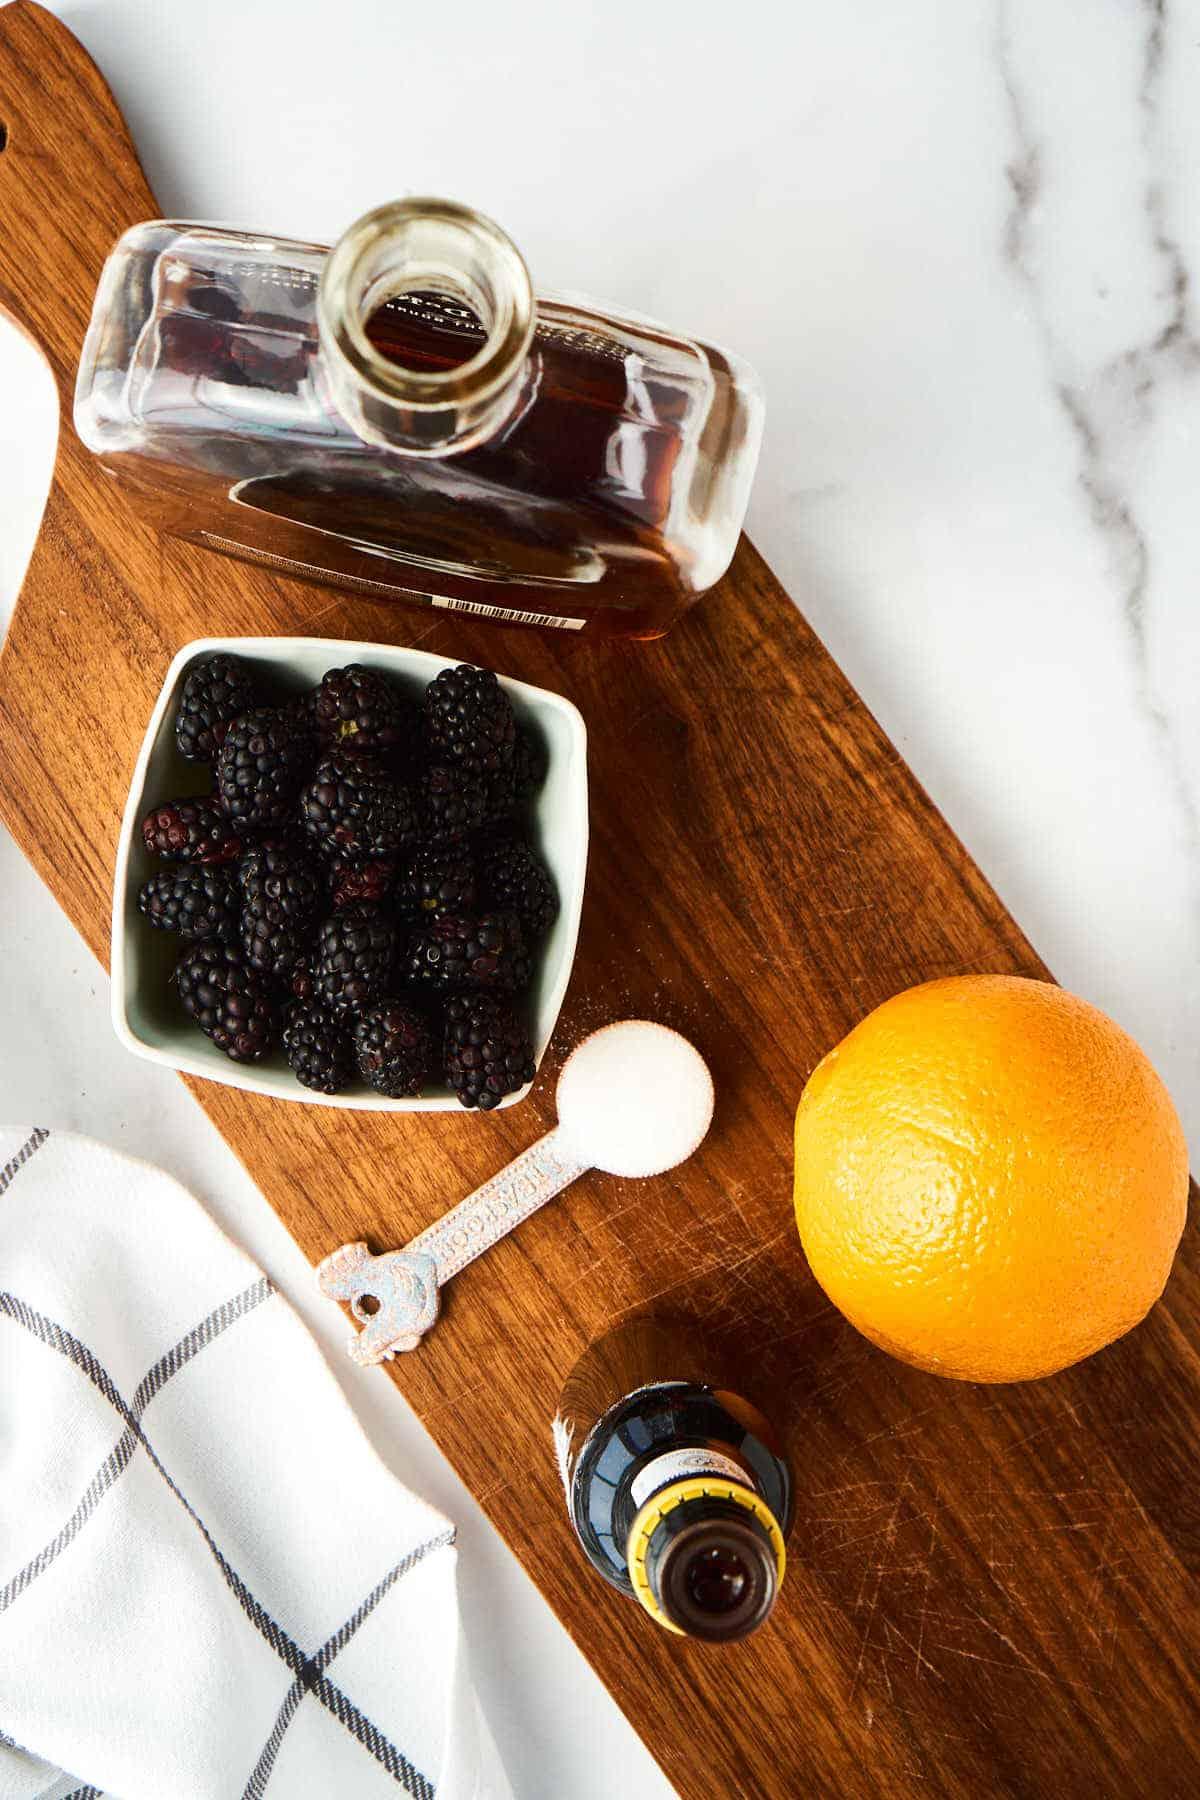 wooden board with bottle of bourbon, whole orange, basket of blueberries, sugar